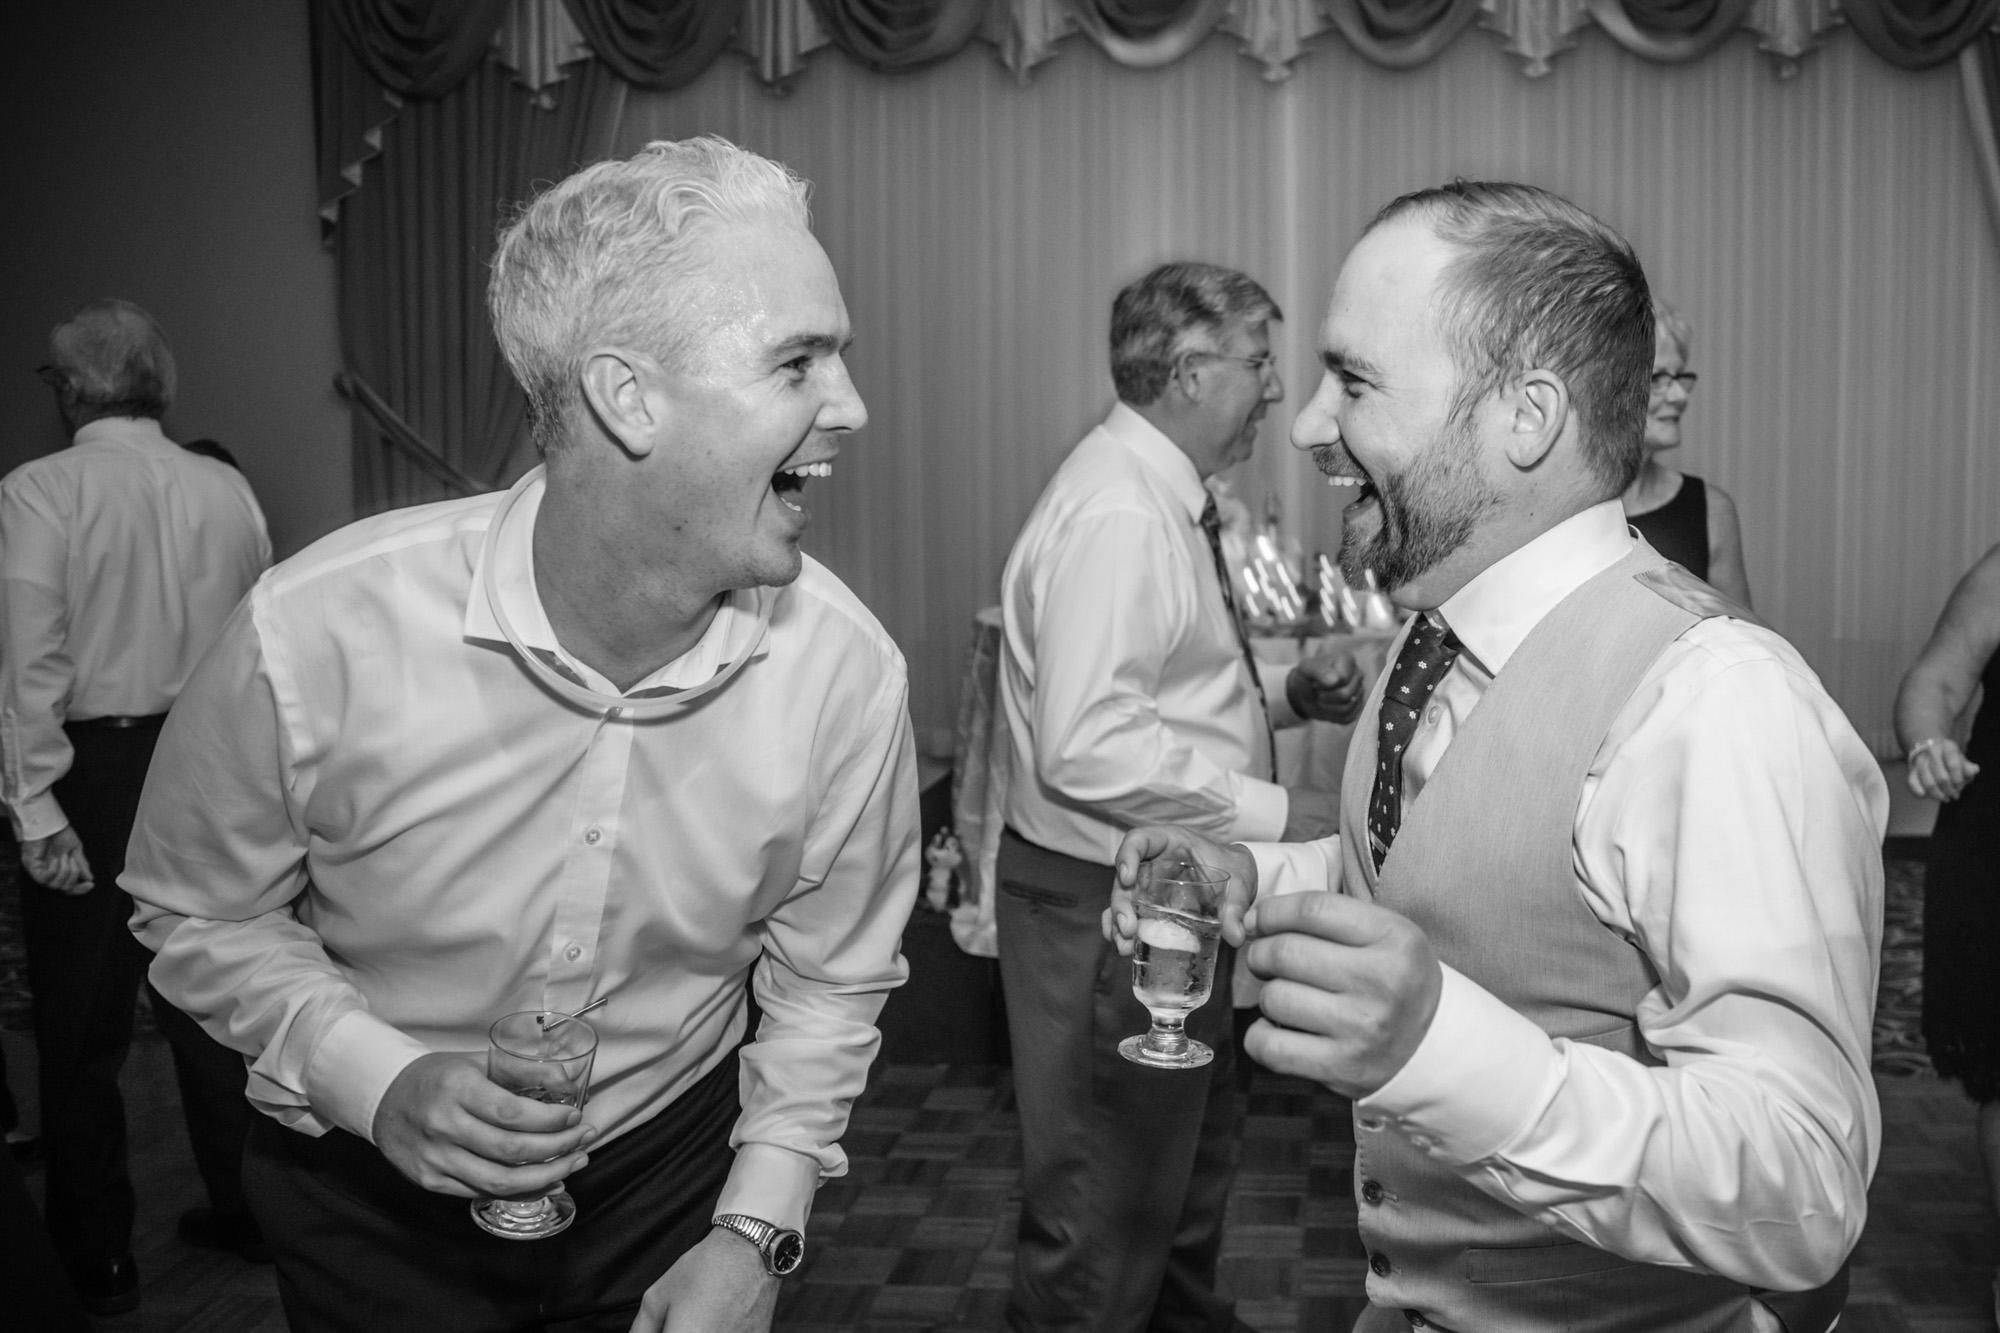 scranton_wedding_photographer_lettieri_pa (39 of 47).jpg